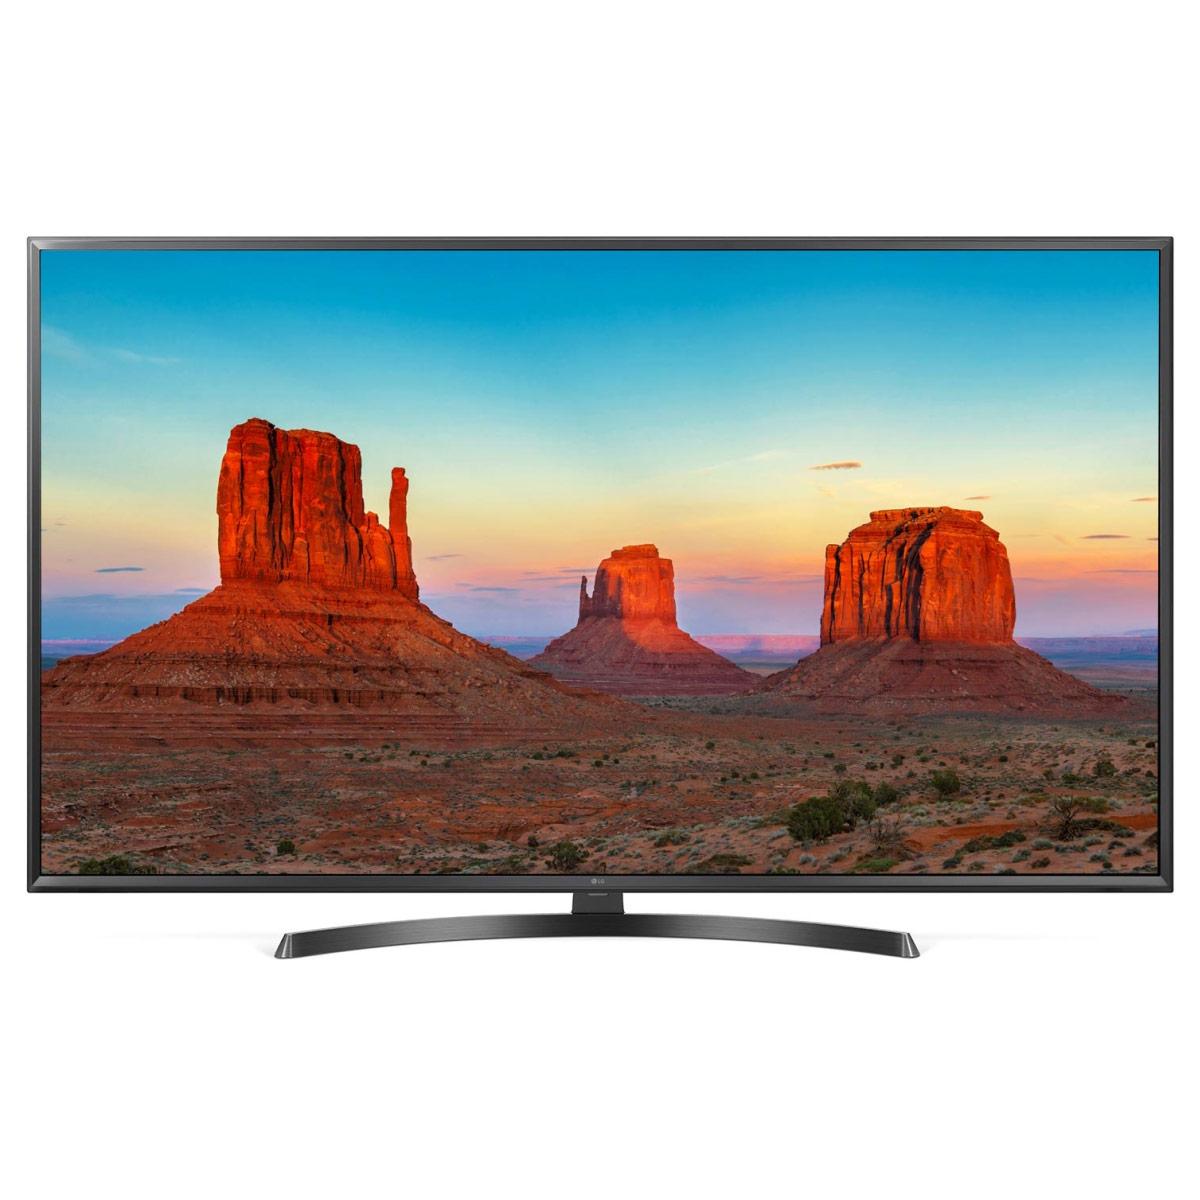 "TV LG 55UK6470 Téléviseur LED 4K 55"" (140 cm) 16/9 - 3840 x 2160 pixels - Ultra HD 2160p - HDR - Wi-Fi - Bluetooth - 1600 Hz"